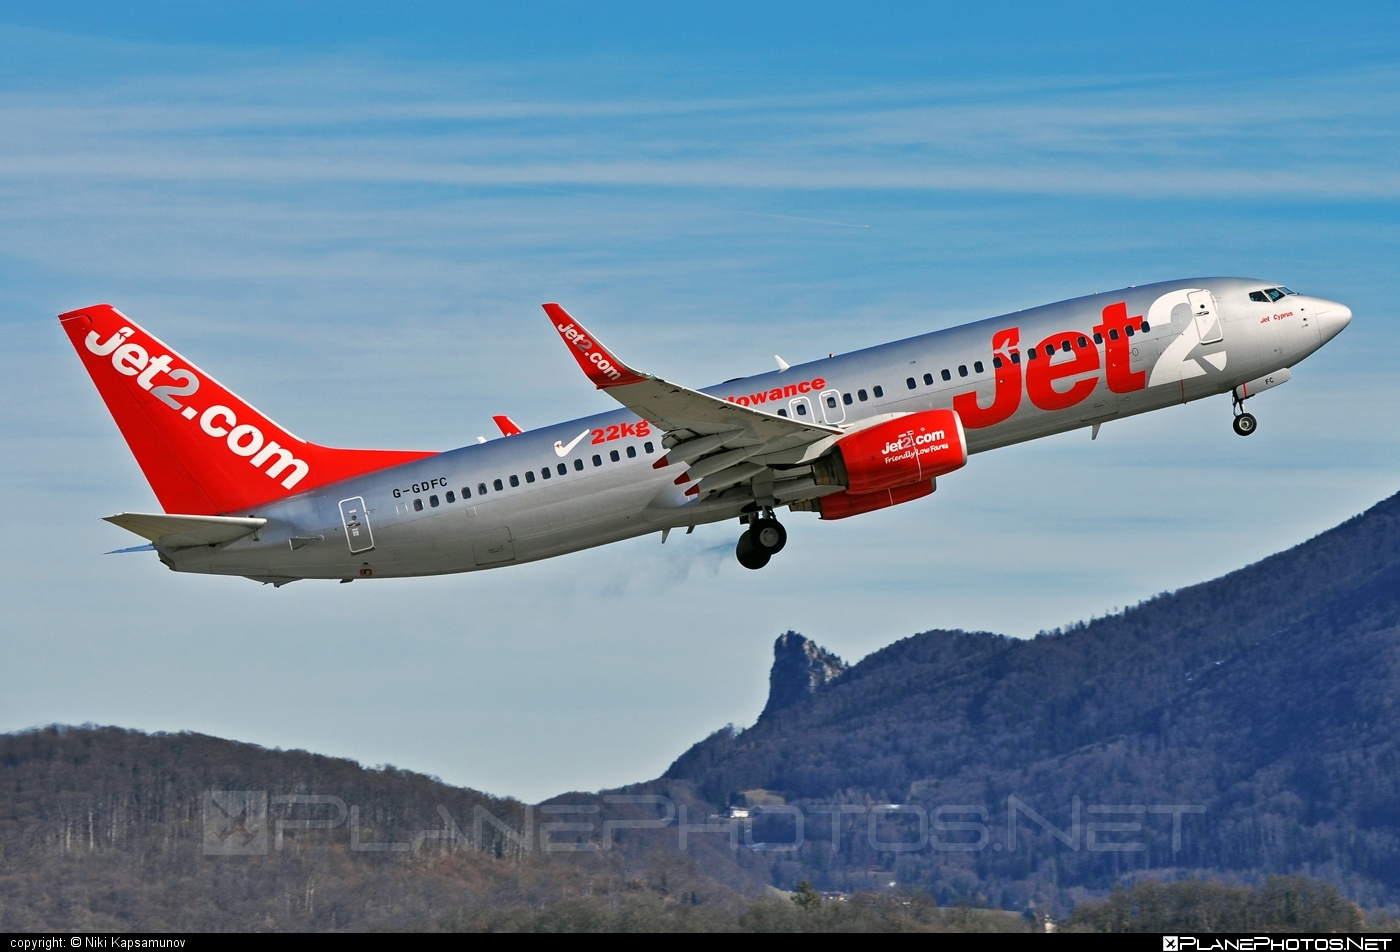 Boeing 737-800 - G-GDFC operated by Jet2 #b737 #b737nextgen #b737ng #boeing #boeing737 #jet2